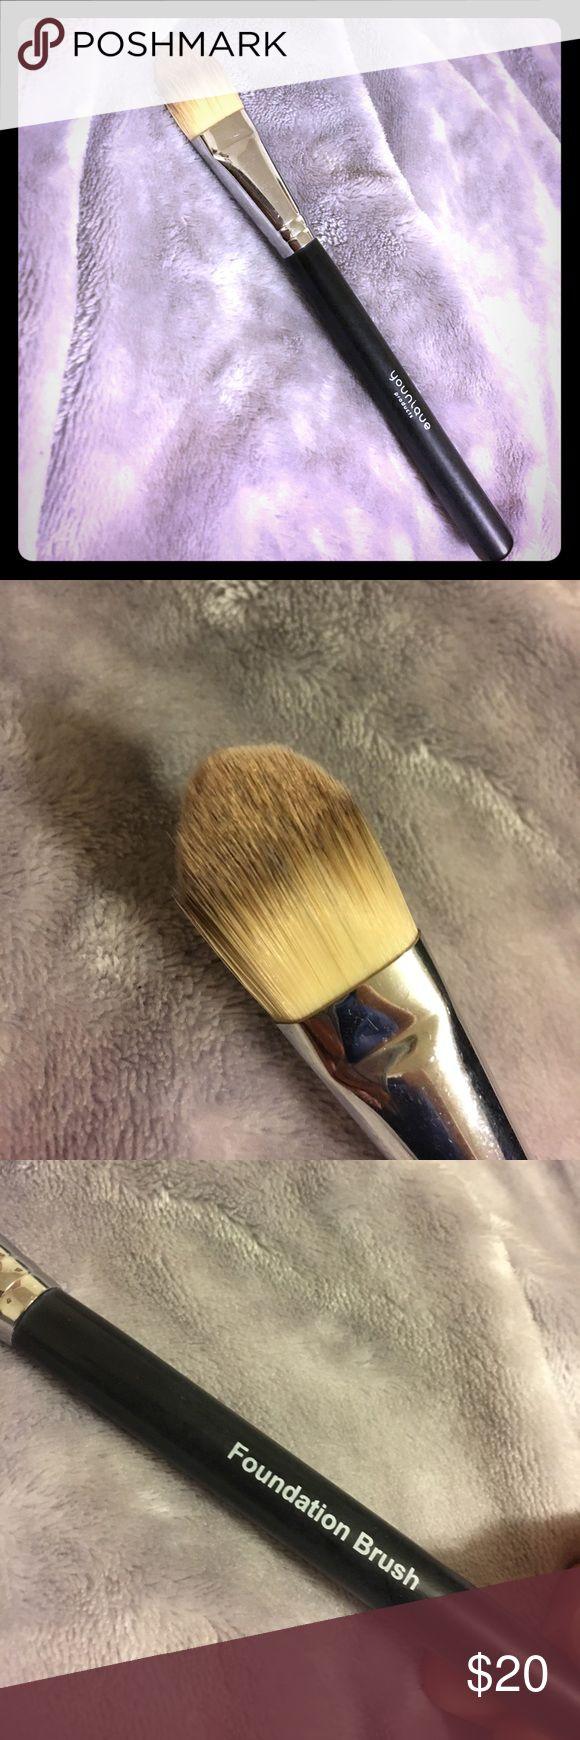 Younique foundation brush Unused, soft foundation brush younique Makeup Brushes & Tools